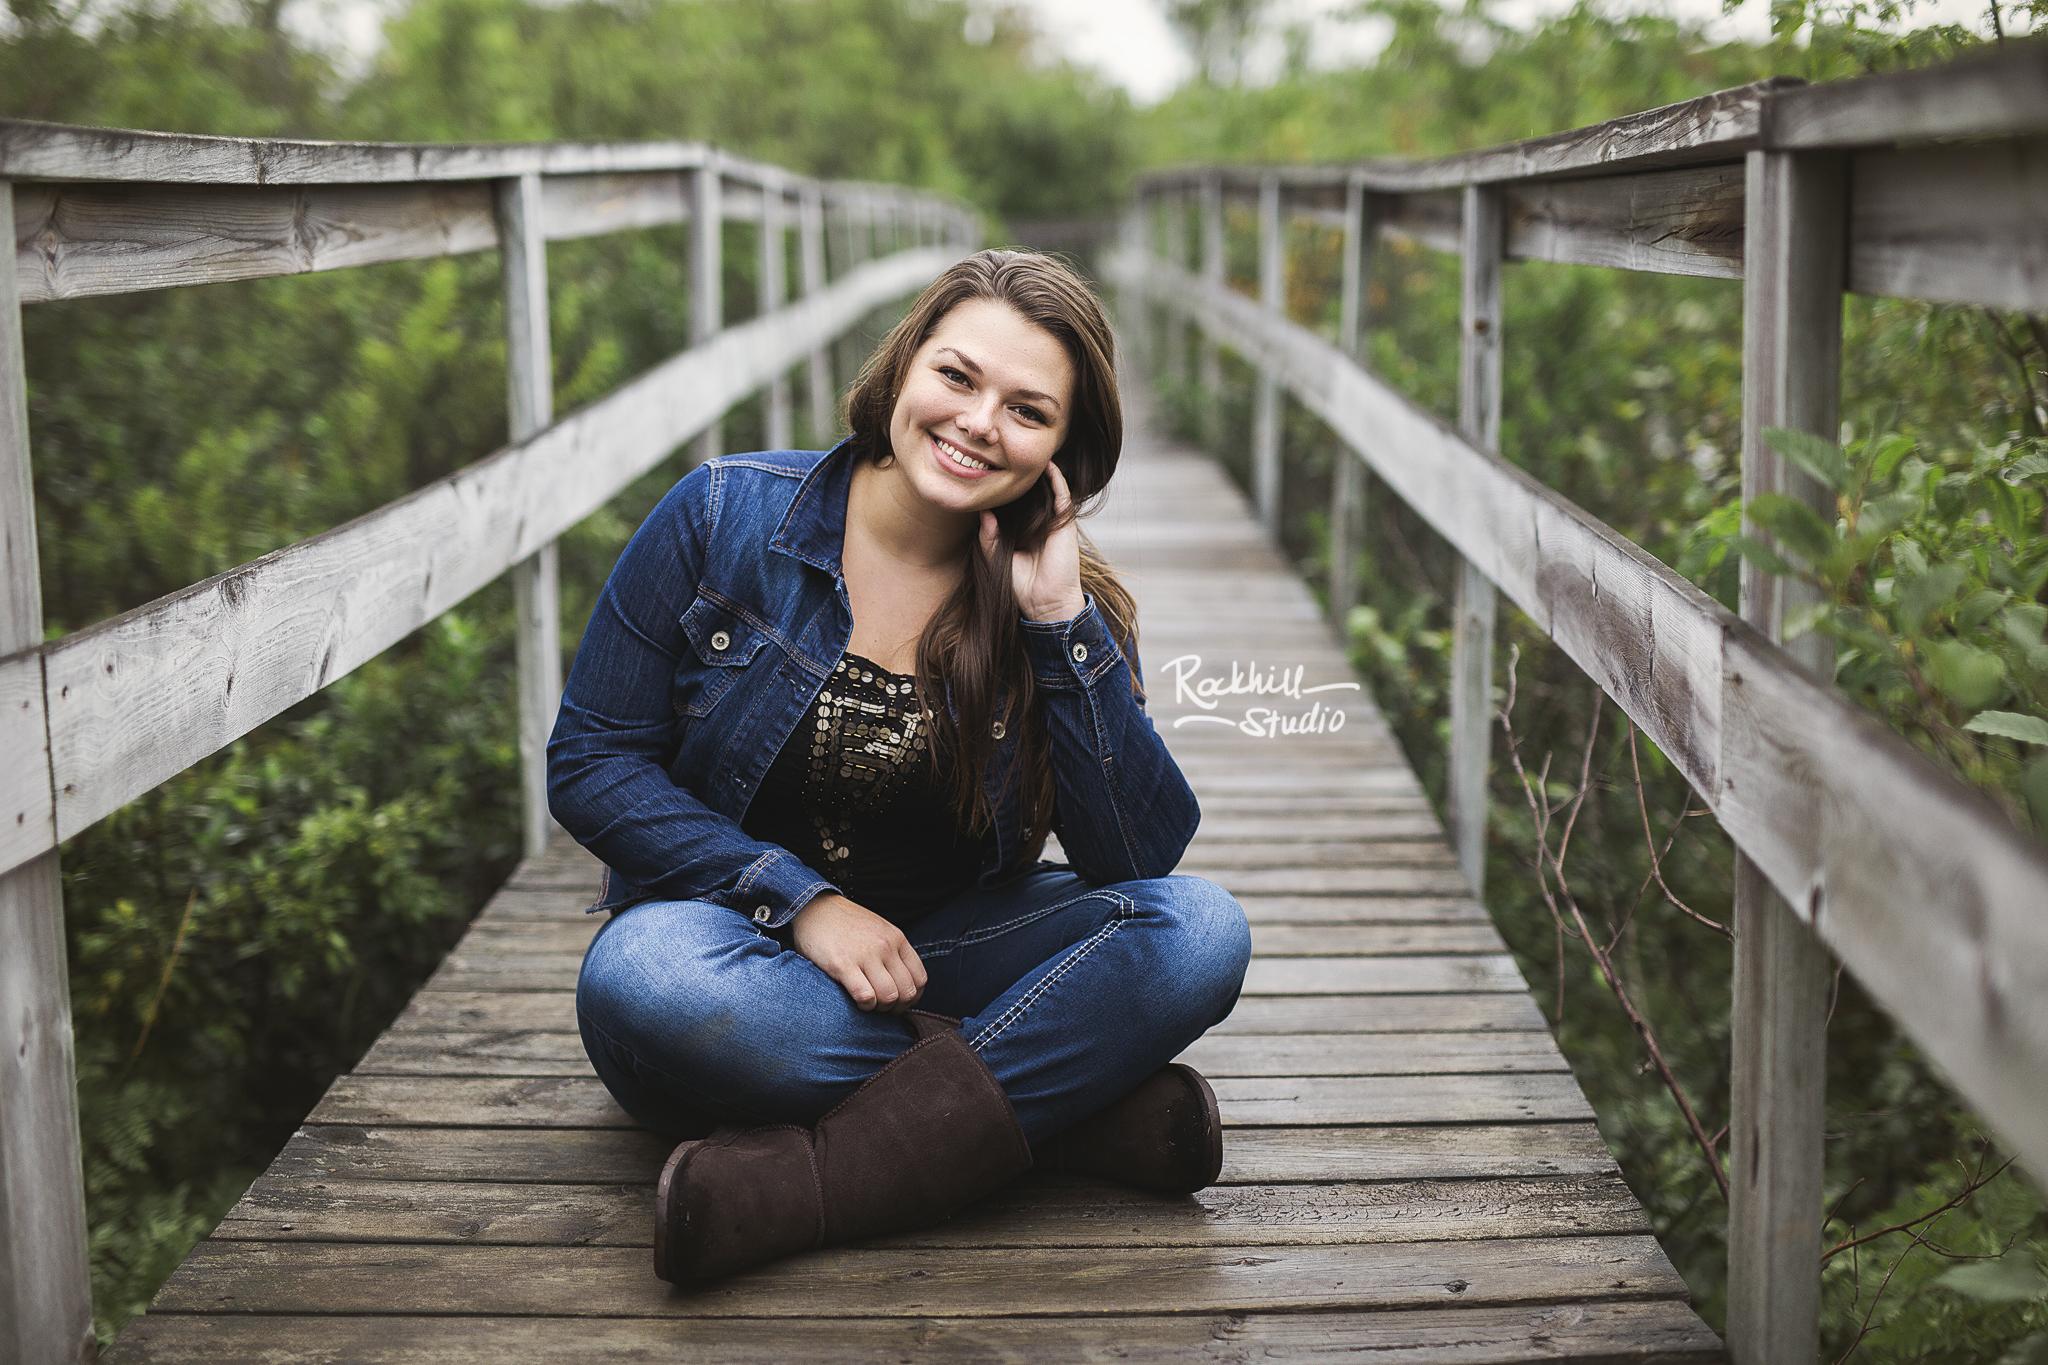 upper-peninsula-senior-photographer-marquette-rockhill-studio-michigan-girl-boardwalk.jpg